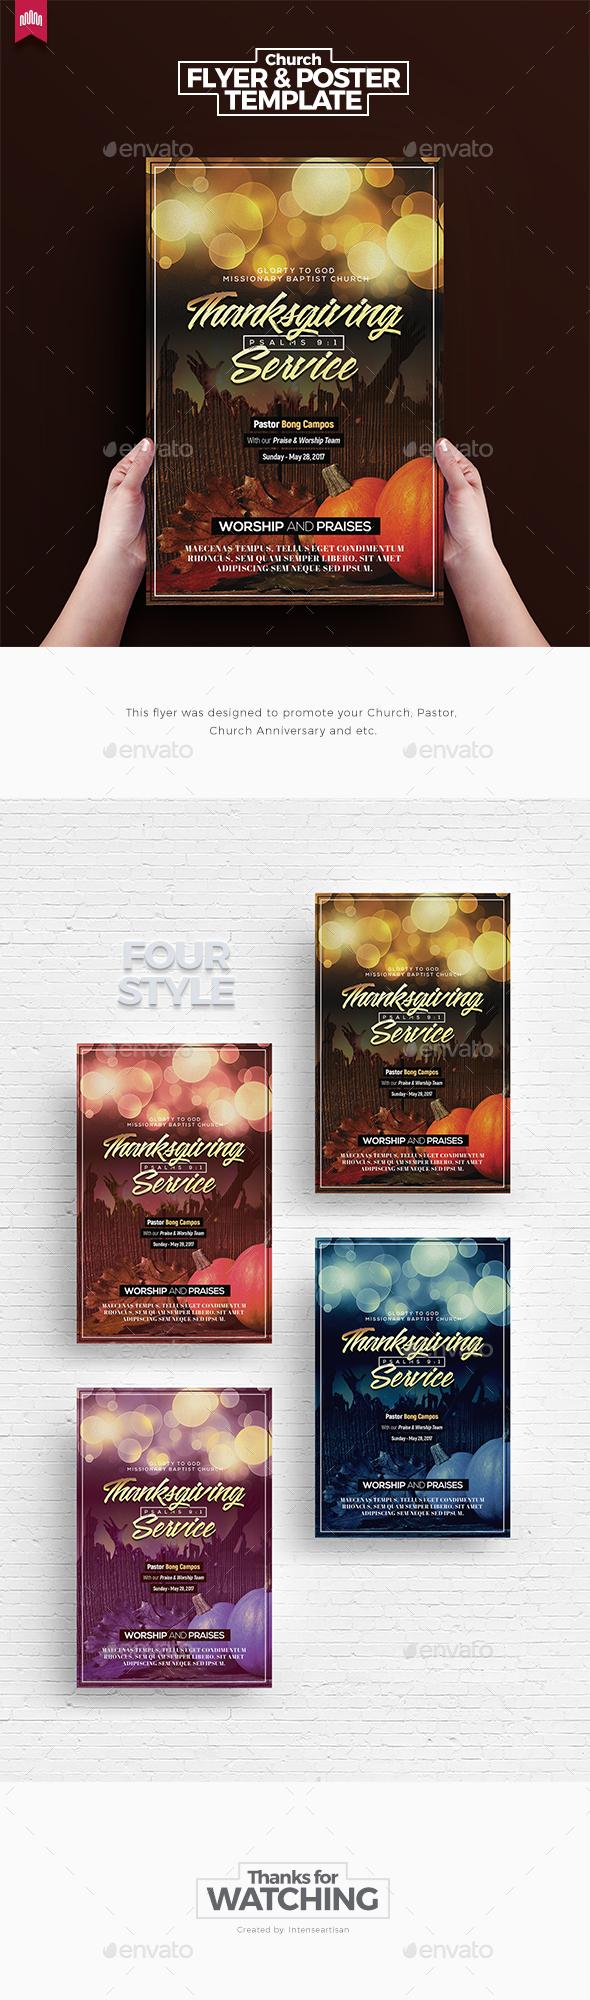 Thanksgiving Service - Church Flyer Template